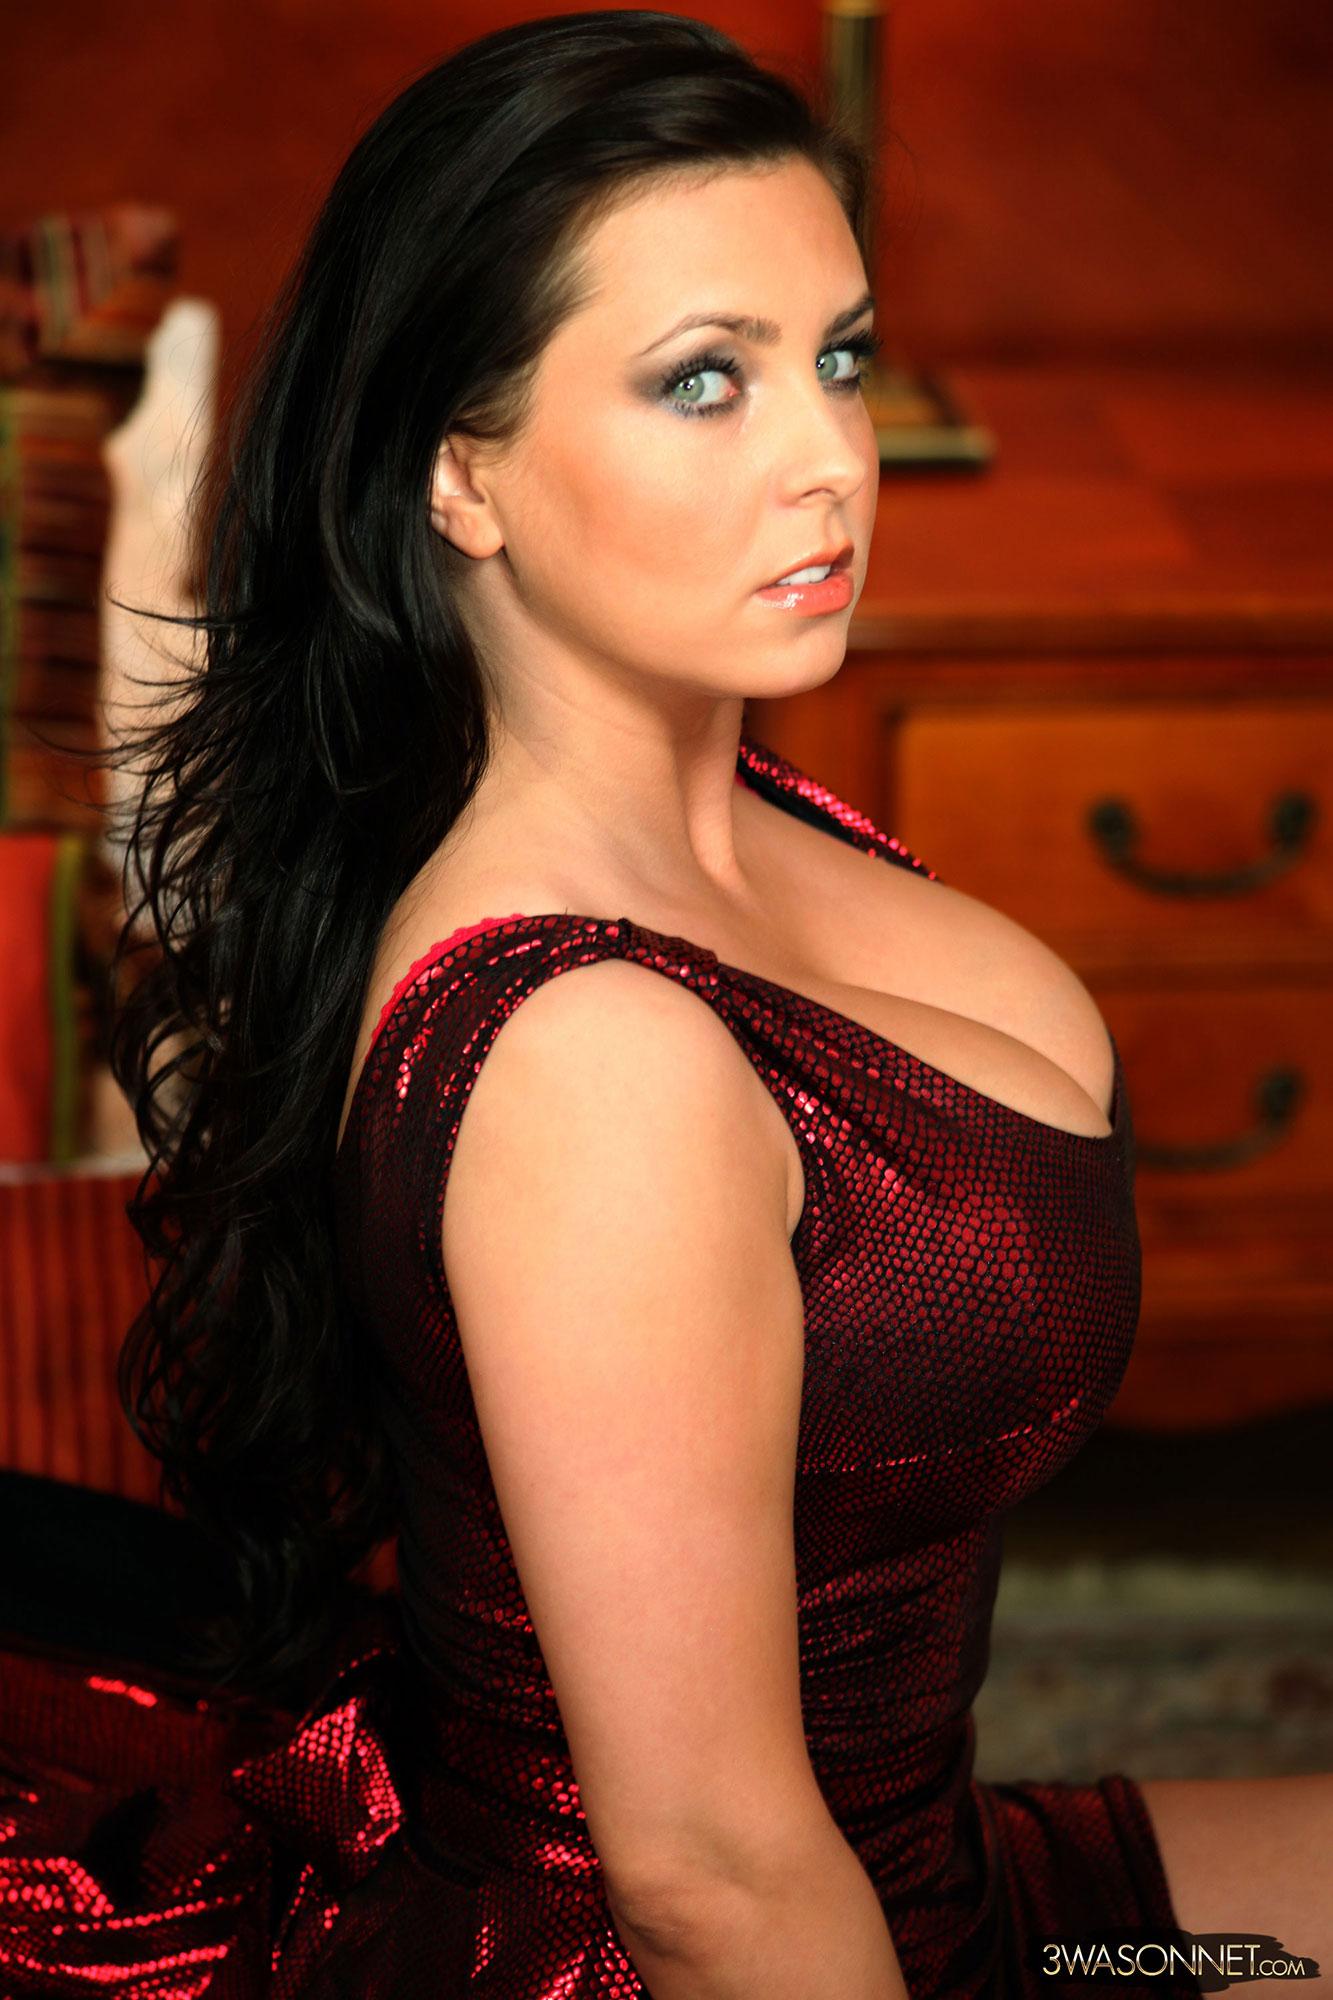 Red shiny dress of Ewa Sonnet